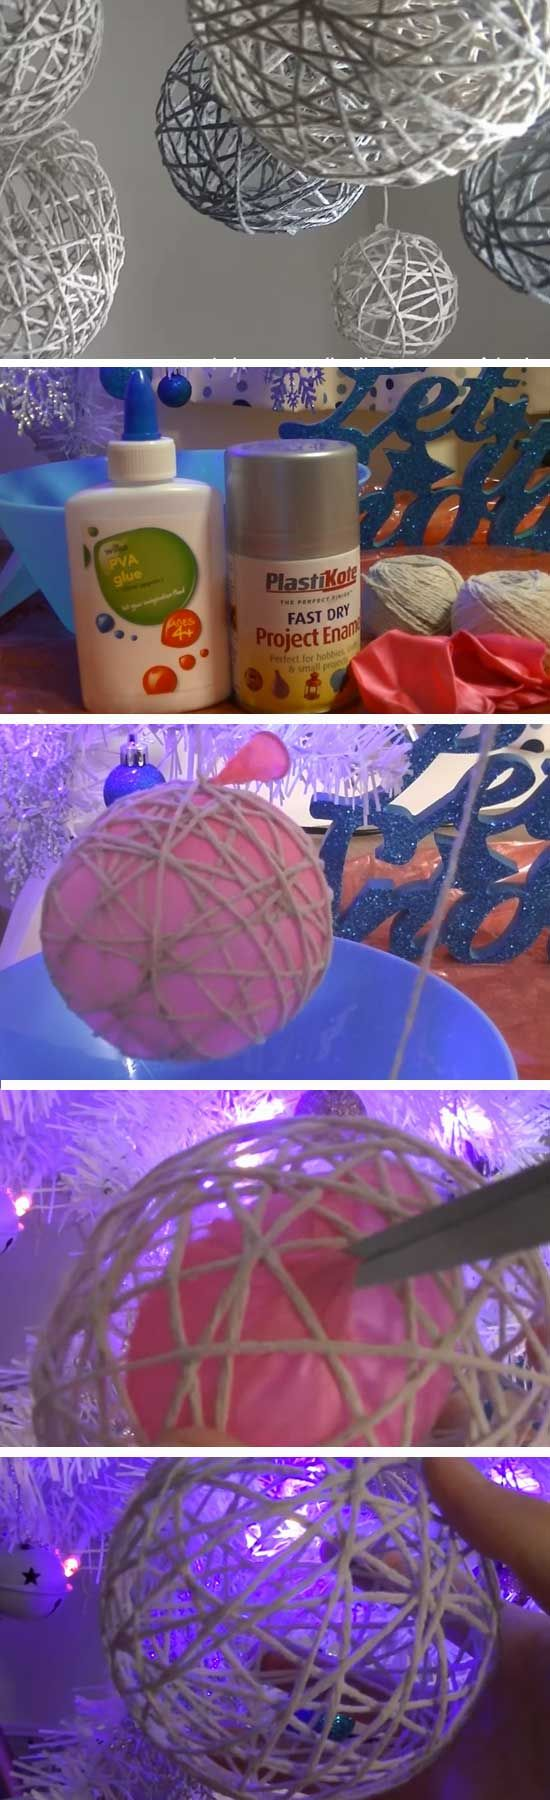 Fun Adult Christmas Party Ideas Part - 29: 25+ DIY Christmas Party Ideas For Adults U2013 Fab Festive Fun!